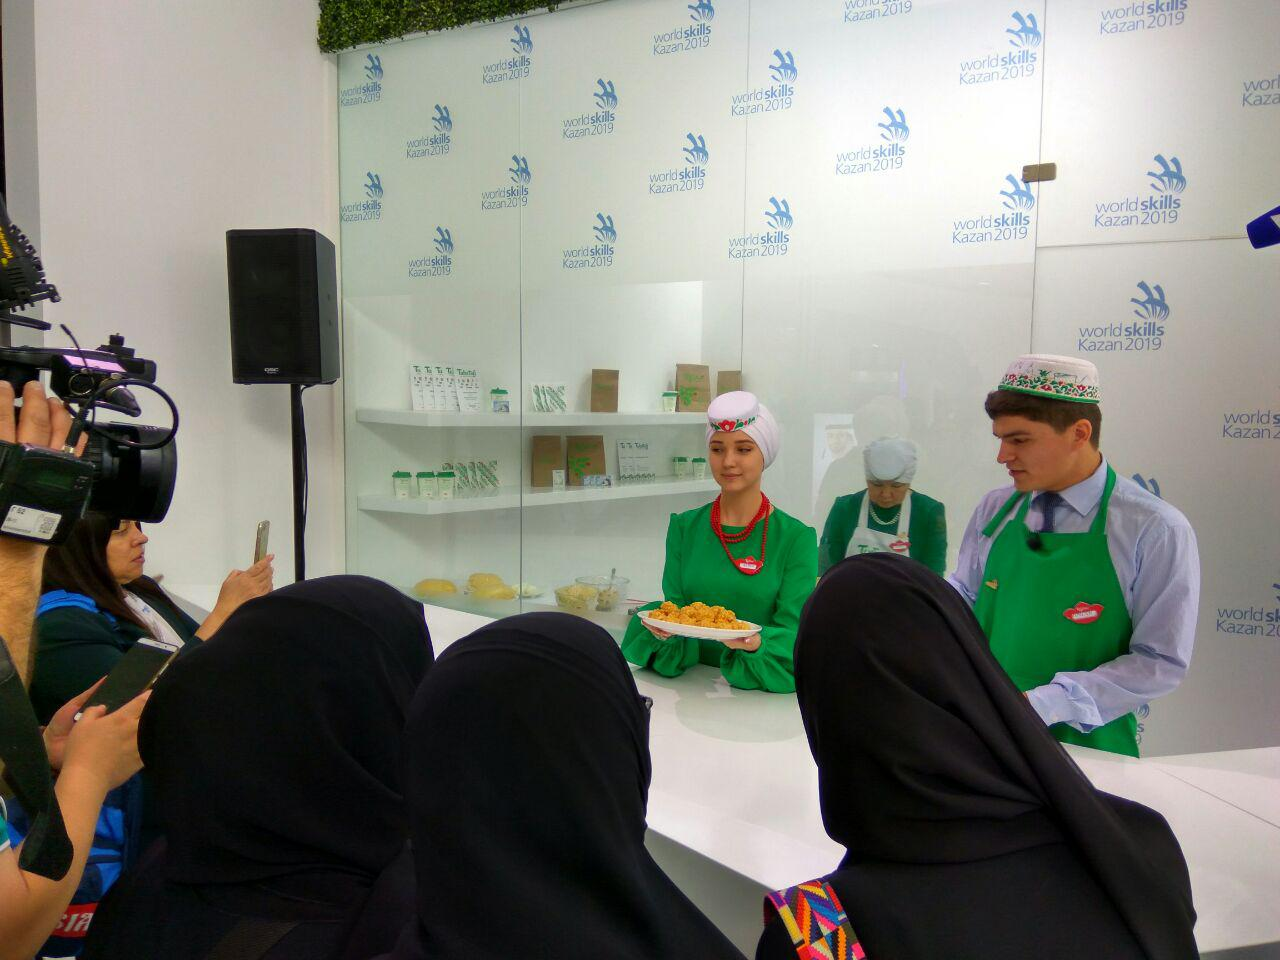 Гости сметают чак-чак со стенда Казани на WorldSkills в Абу-Даби